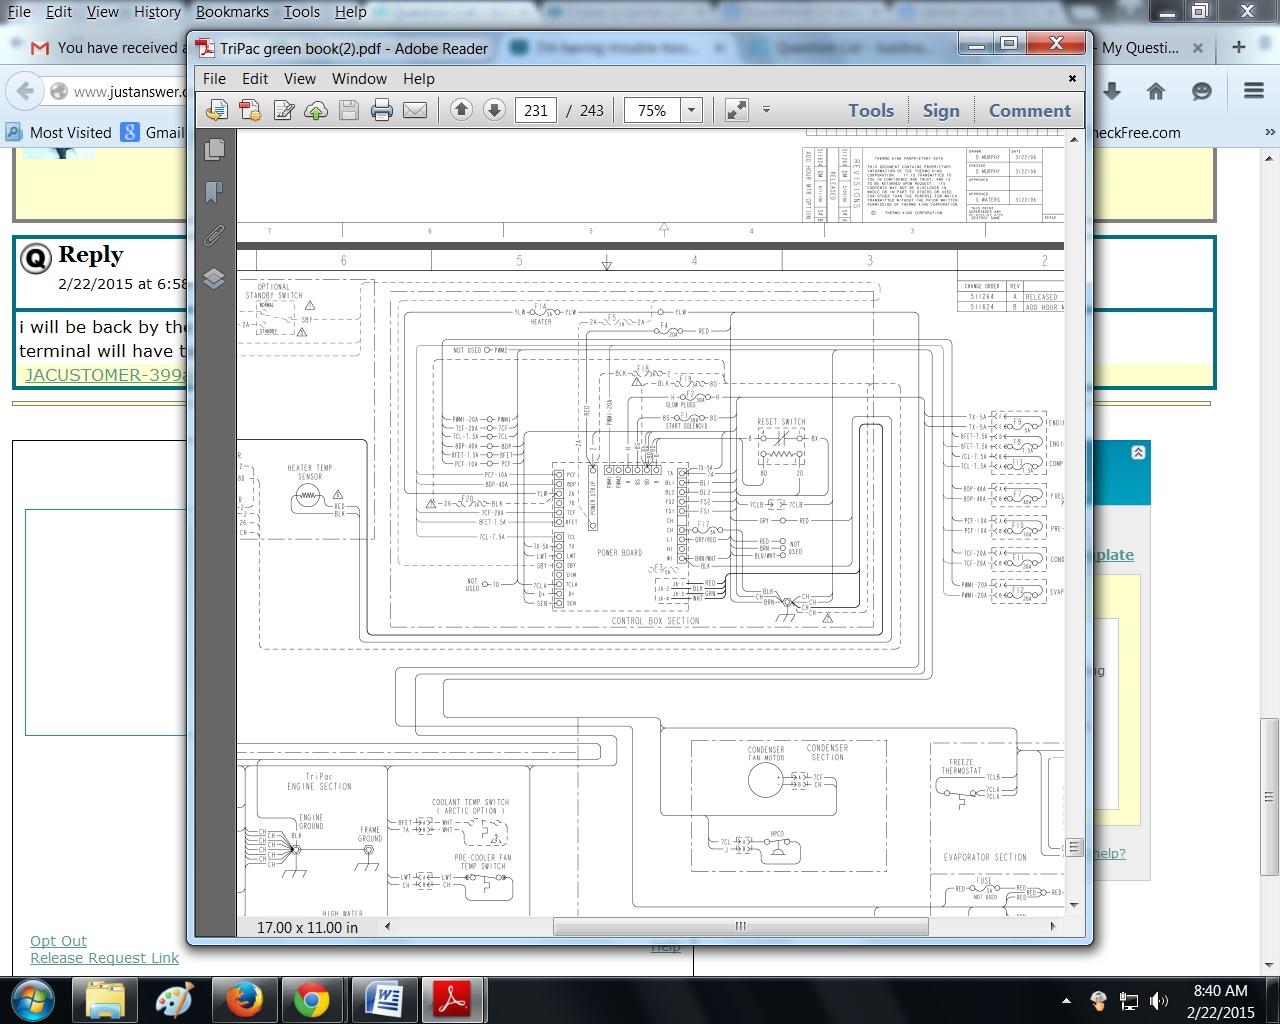 518fe365-35a4-4d85-98bd-5f77aa8a890a_circuit breaker.jpg